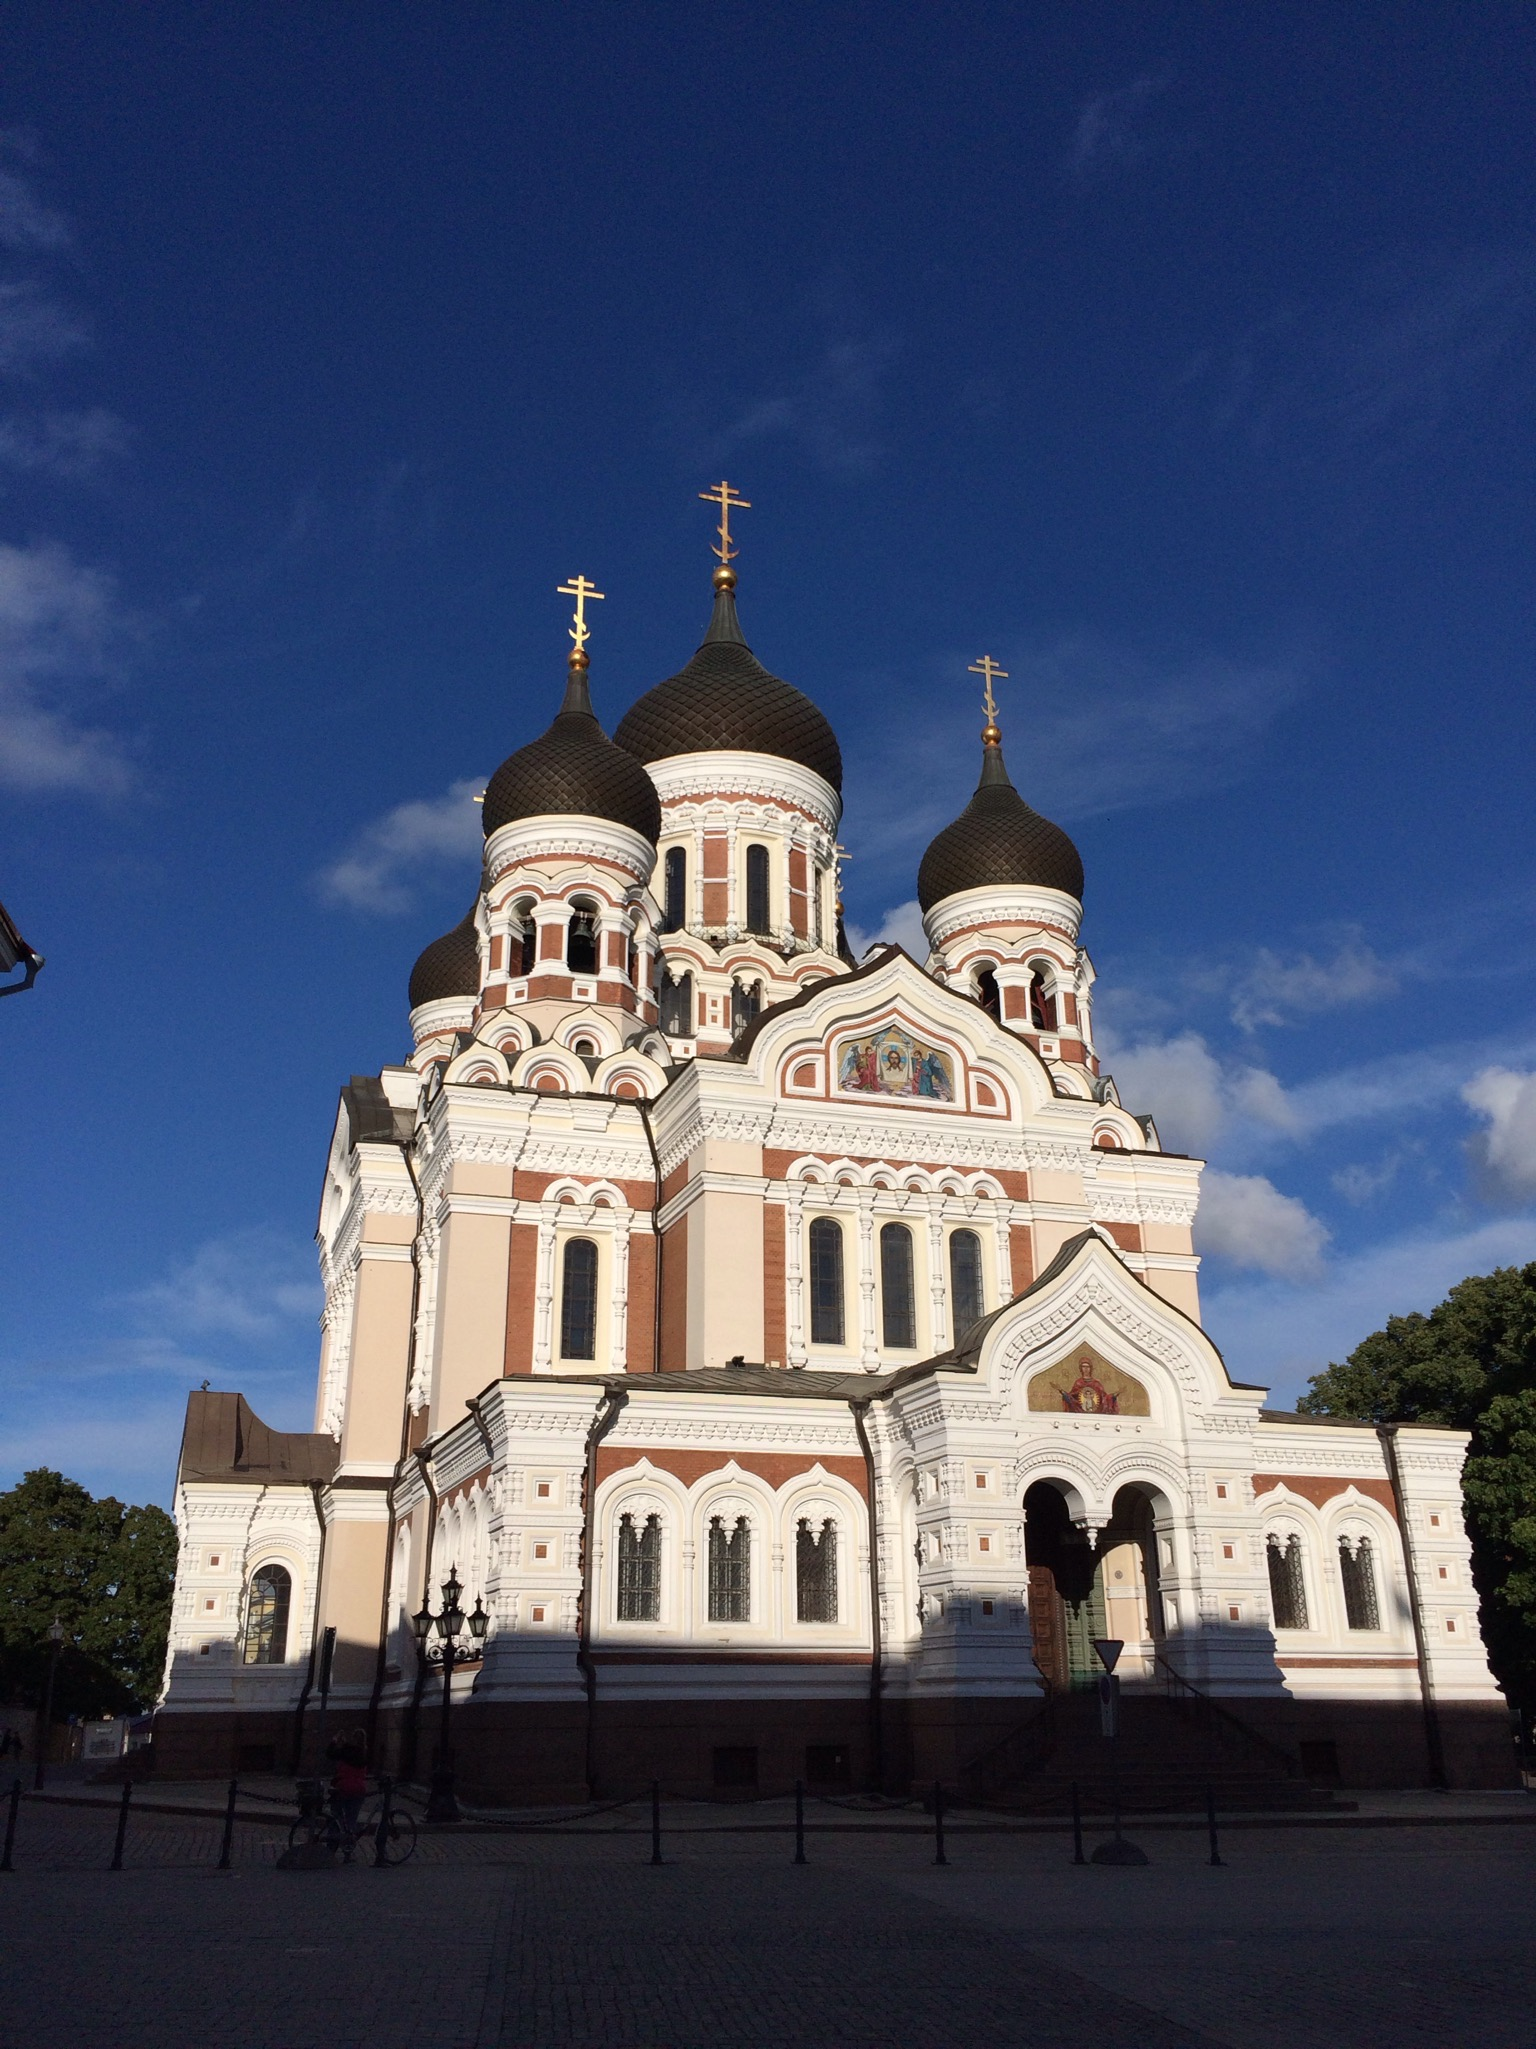 pravoslavný chrám Alexandr Něvskij